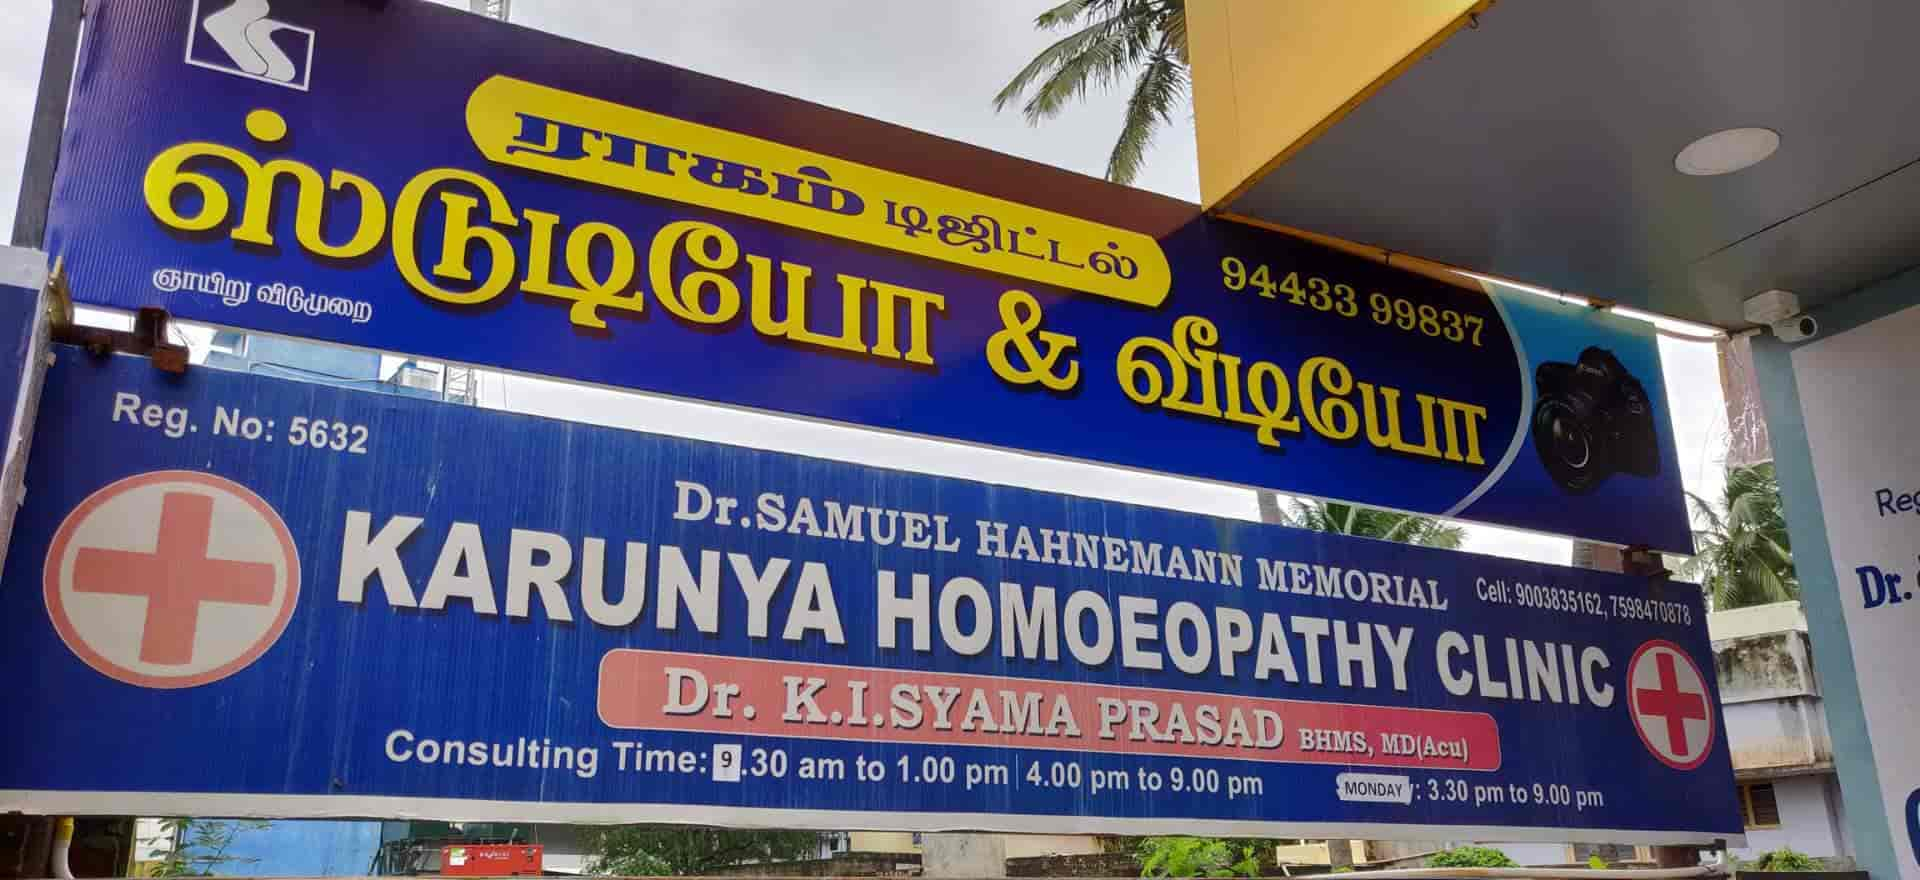 Karunya Homoeopathy Clinic, Nagercoil HO - Clinics in